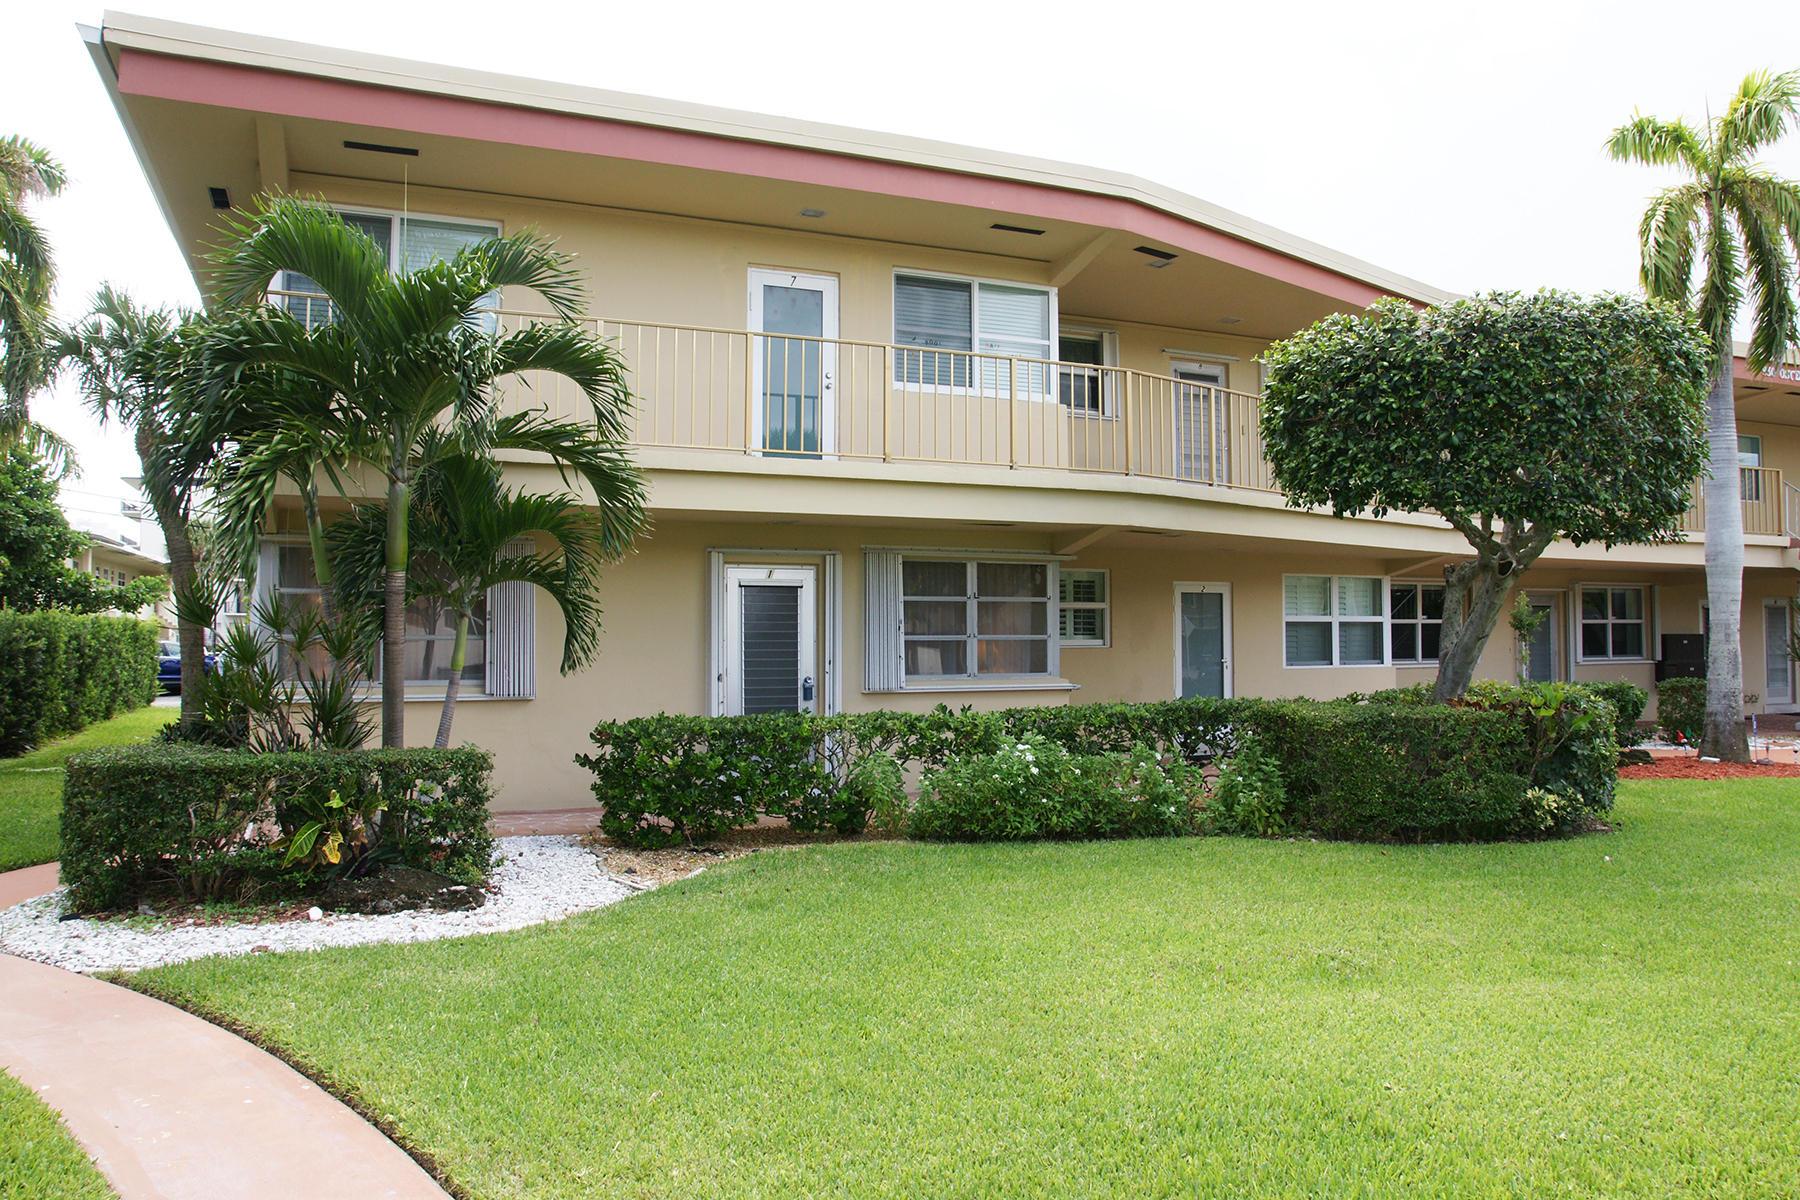 930 Osceola Drive ##1 Boca Raton, FL 33432